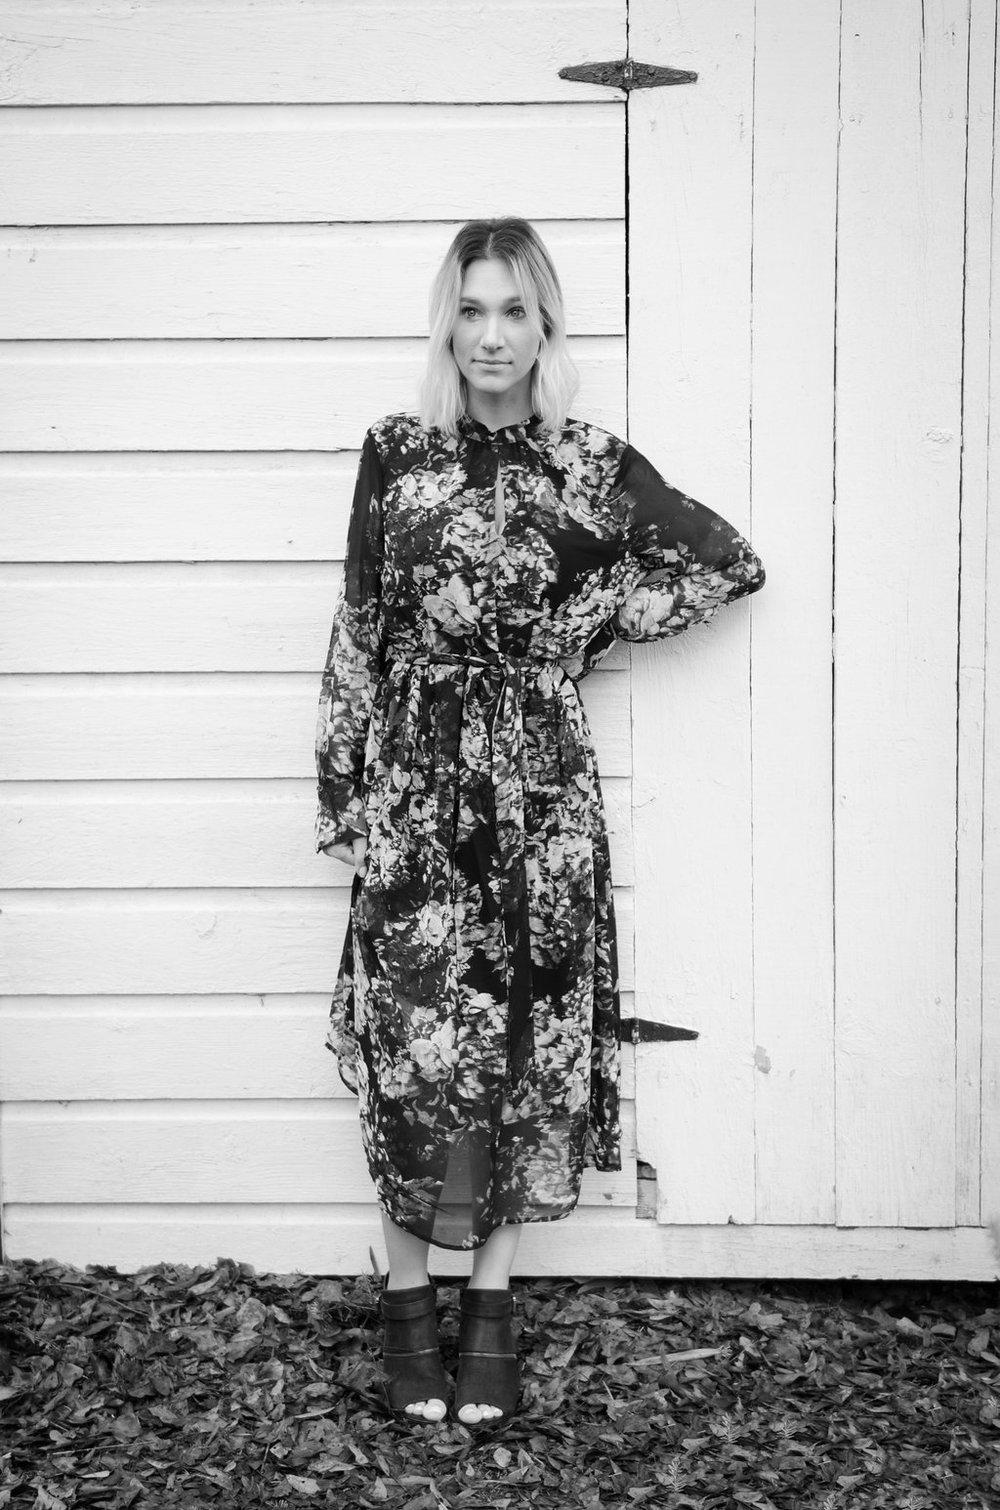 floral dress post 9.11.17.jpg